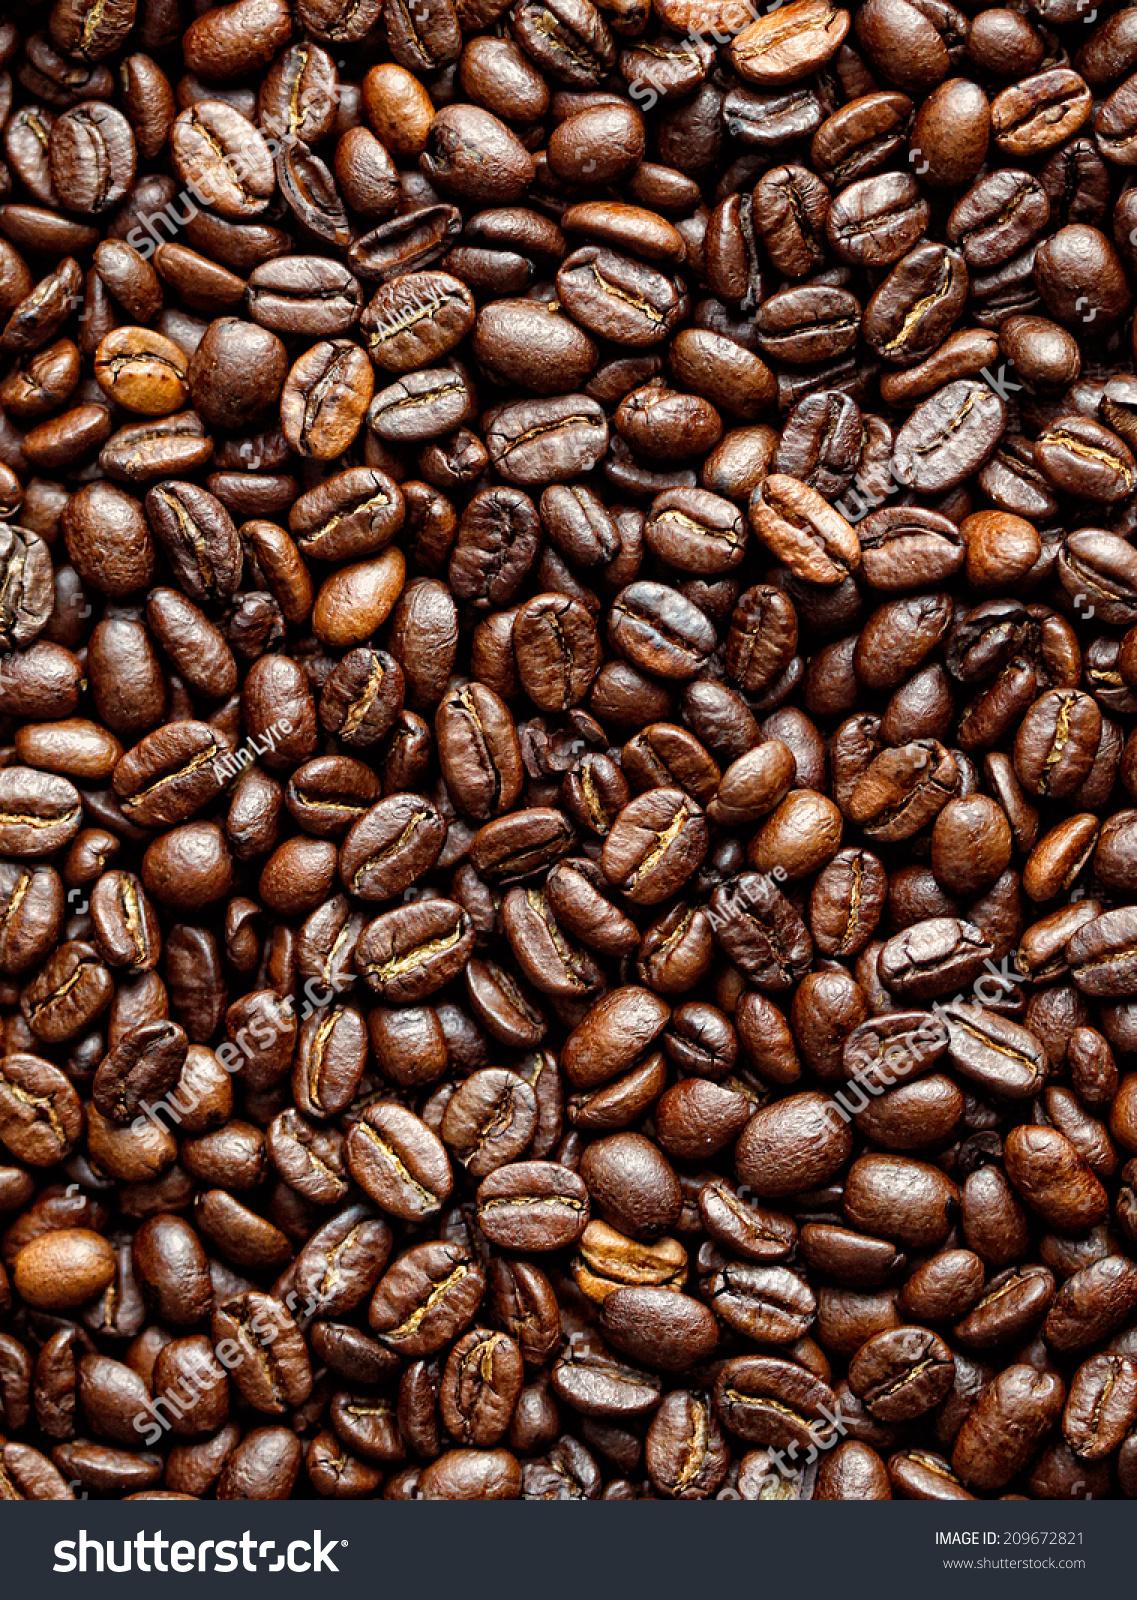 coffee grains stock photo 209672821 shutterstock. Black Bedroom Furniture Sets. Home Design Ideas